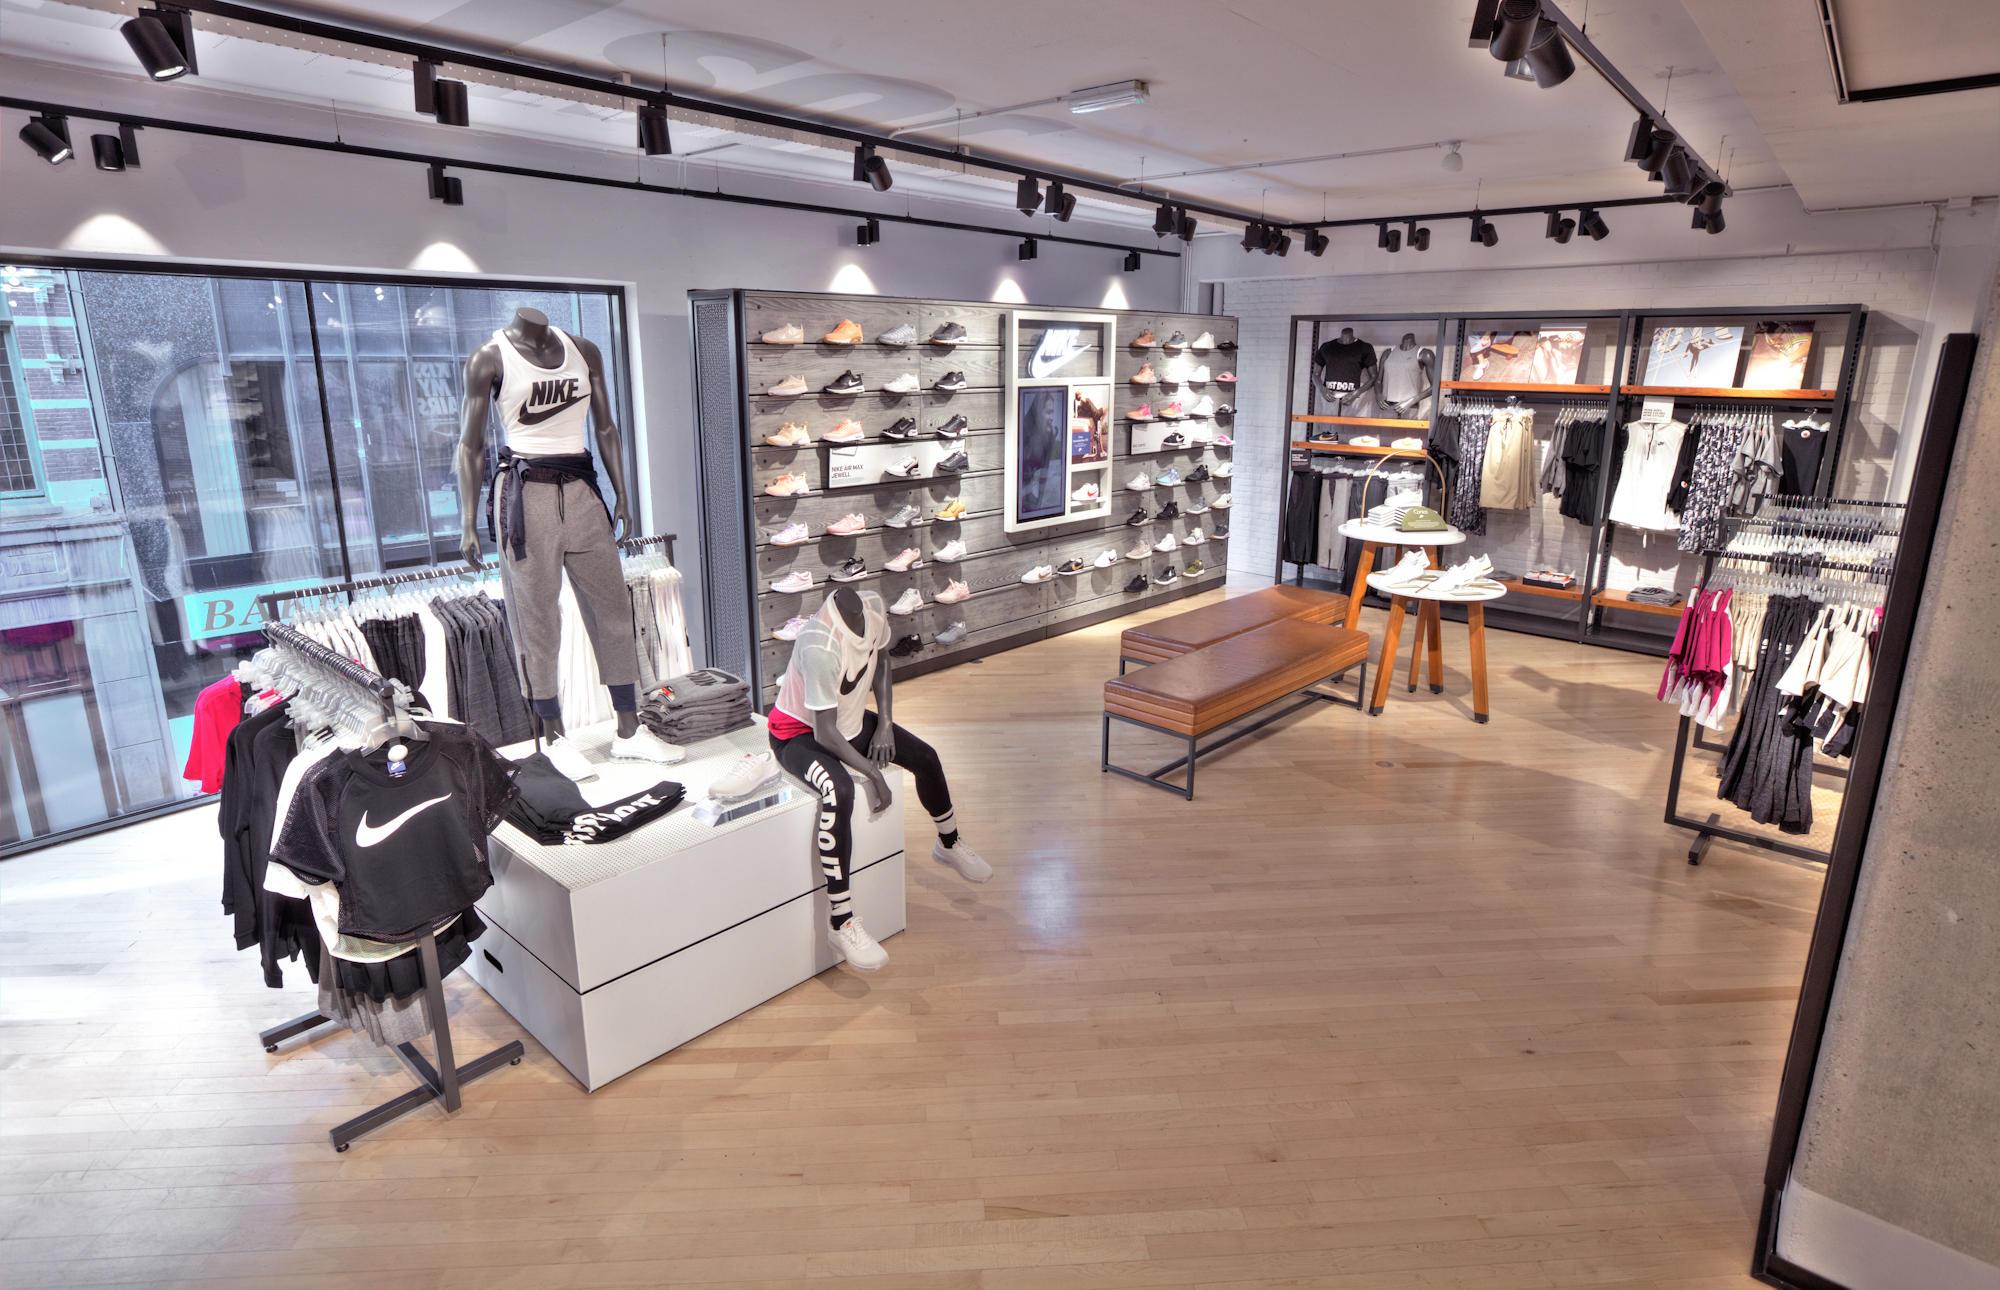 Nike - Openingstijden Nike Kalverstraat 9db3ff7fdb06f